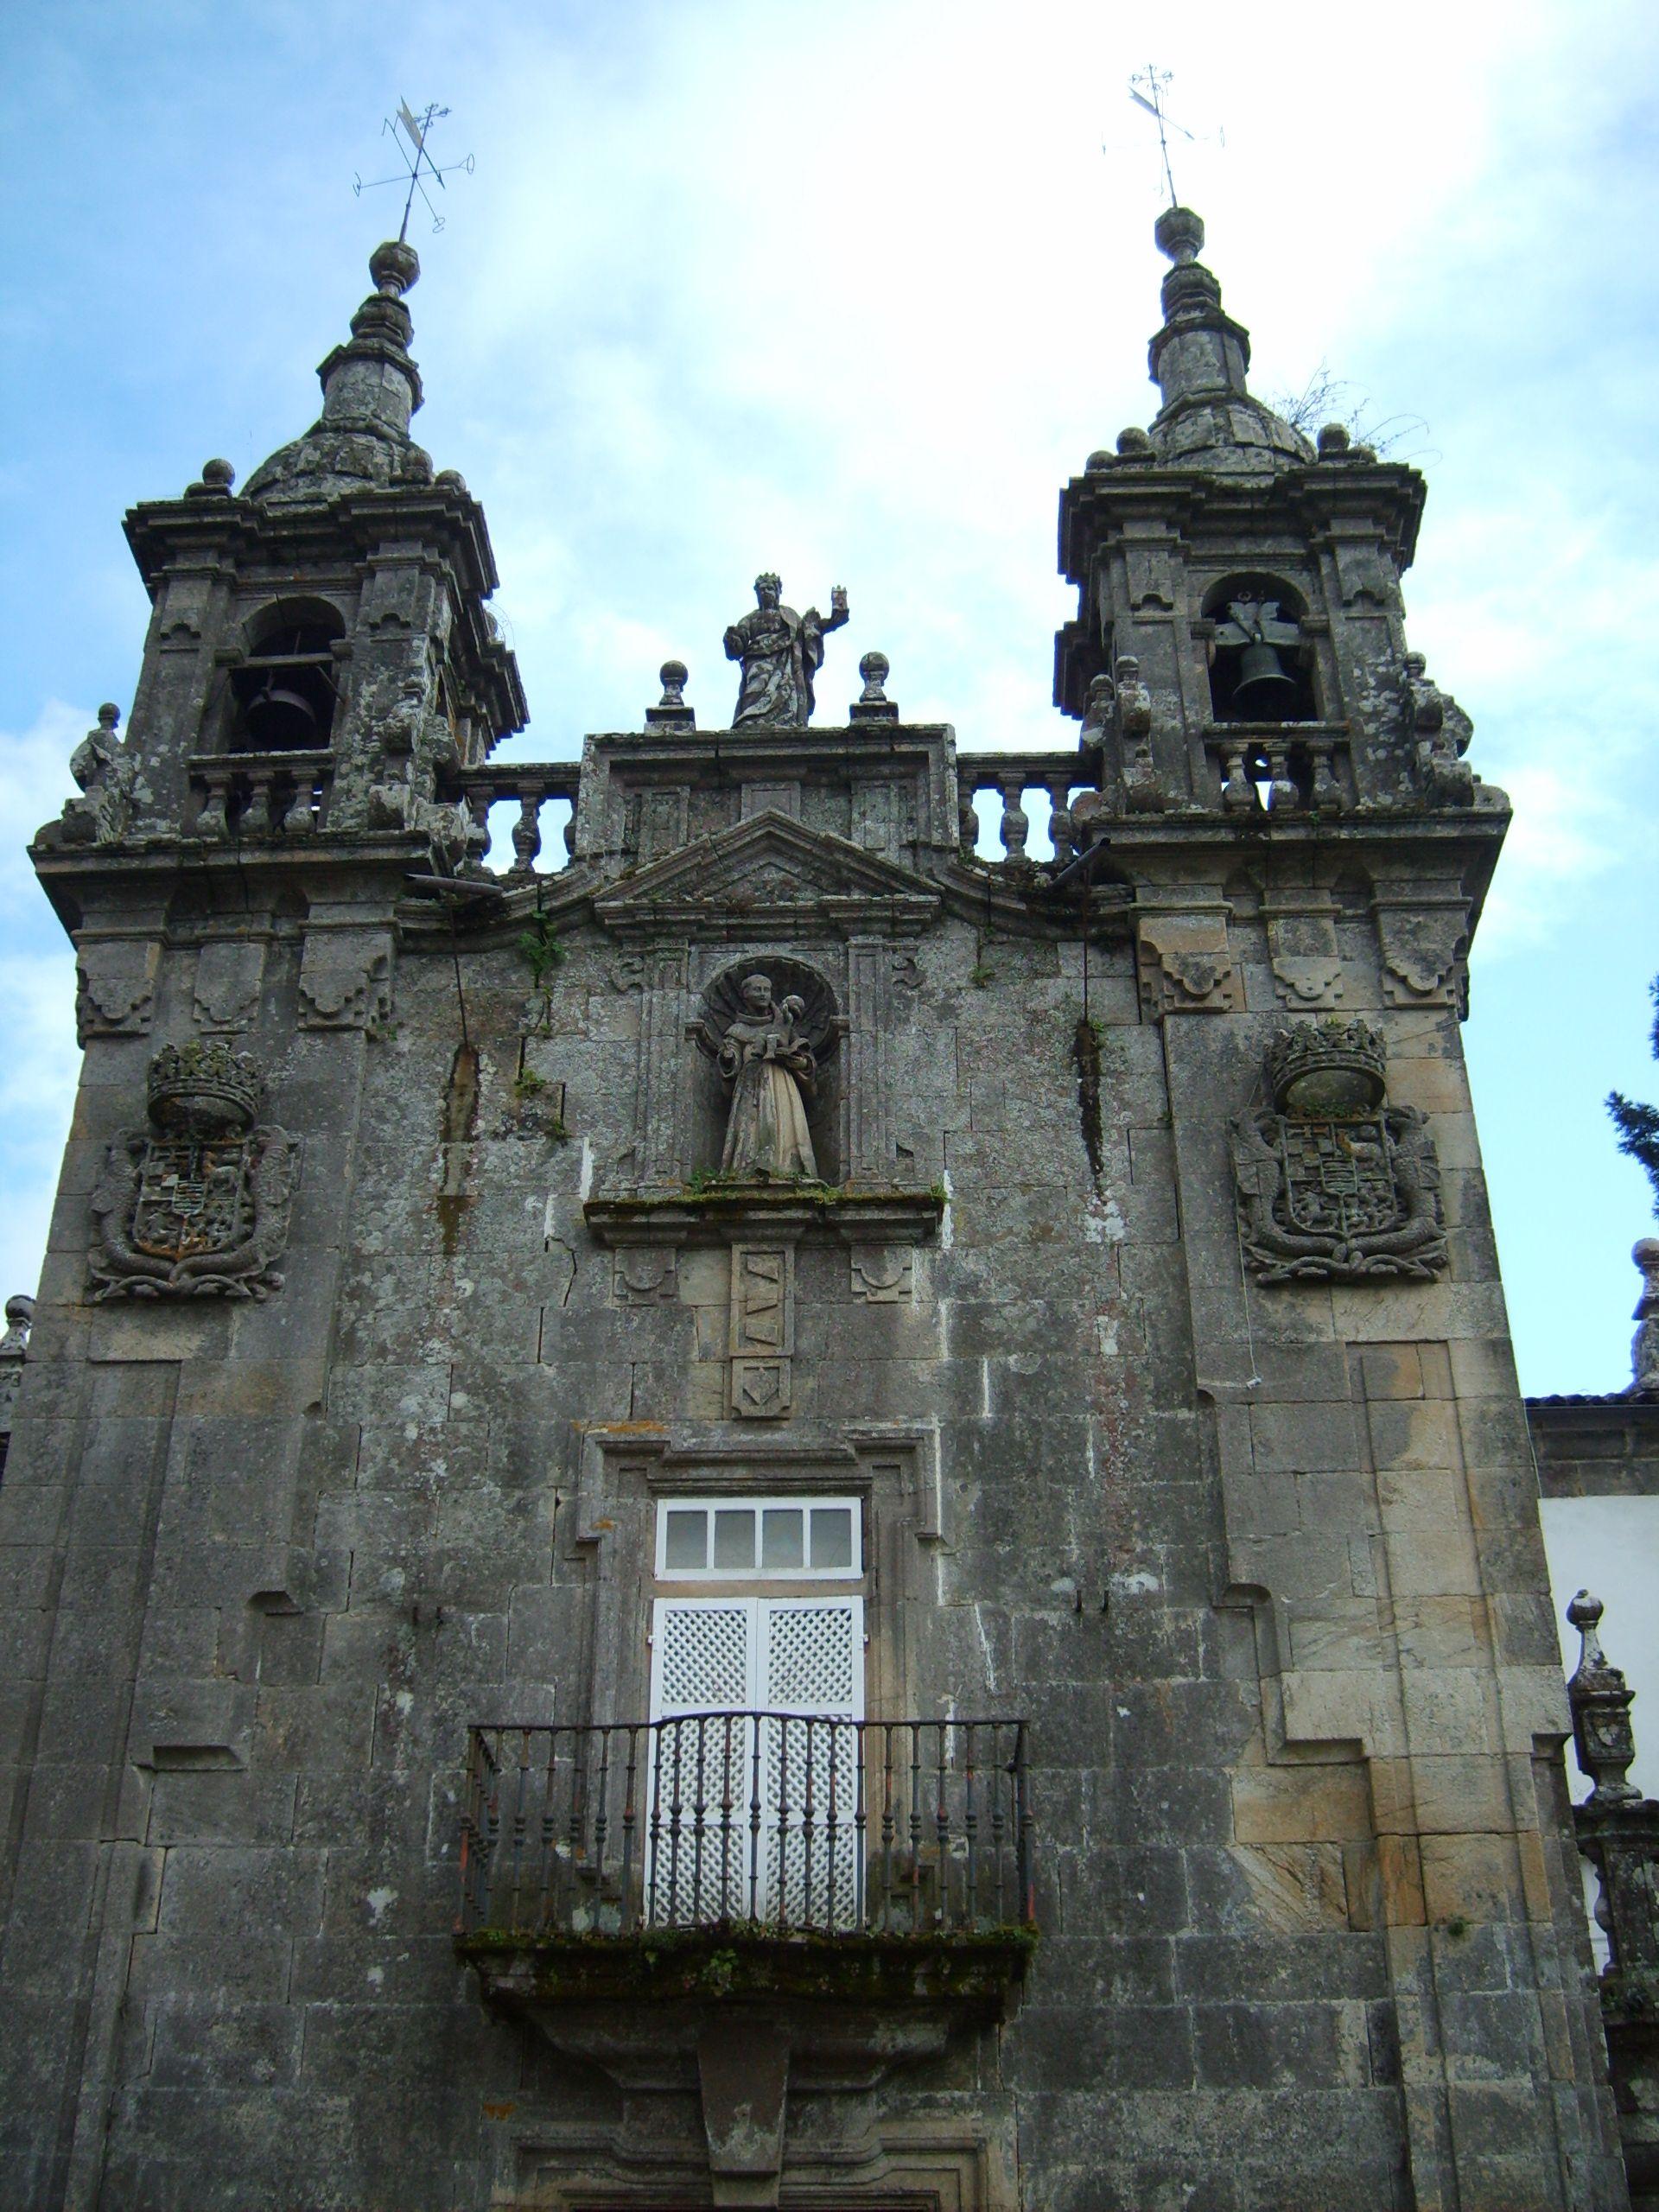 https://upload.wikimedia.org/wikipedia/commons/a/ae/Pazo_de_Oca_-_3.JPG